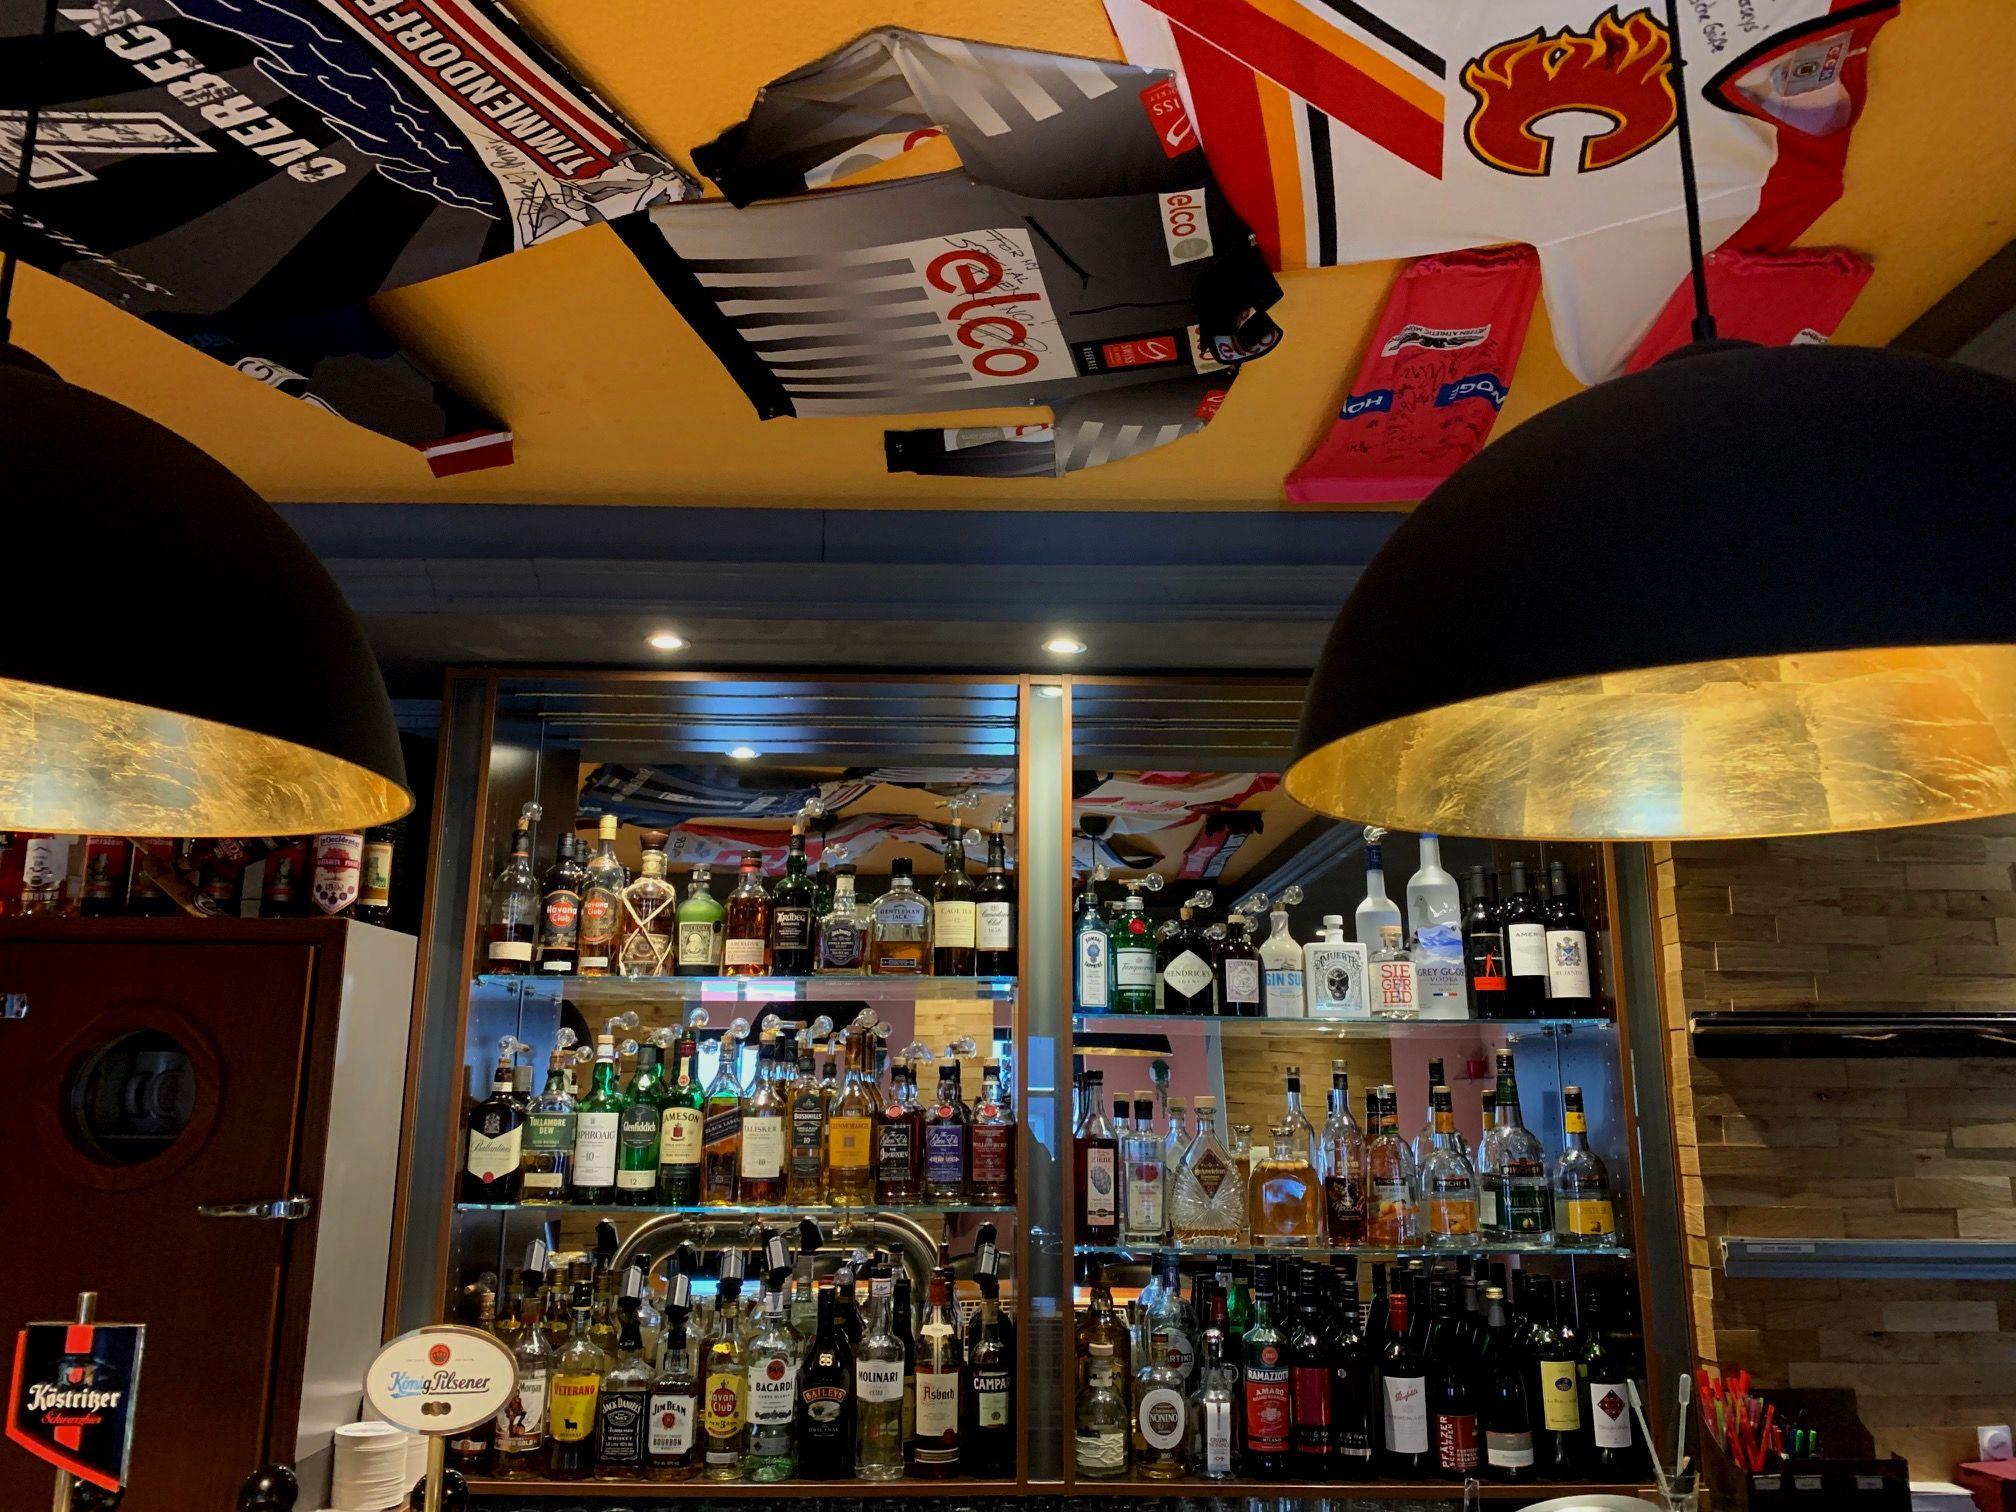 51° NORD - Steakhouse & Bar